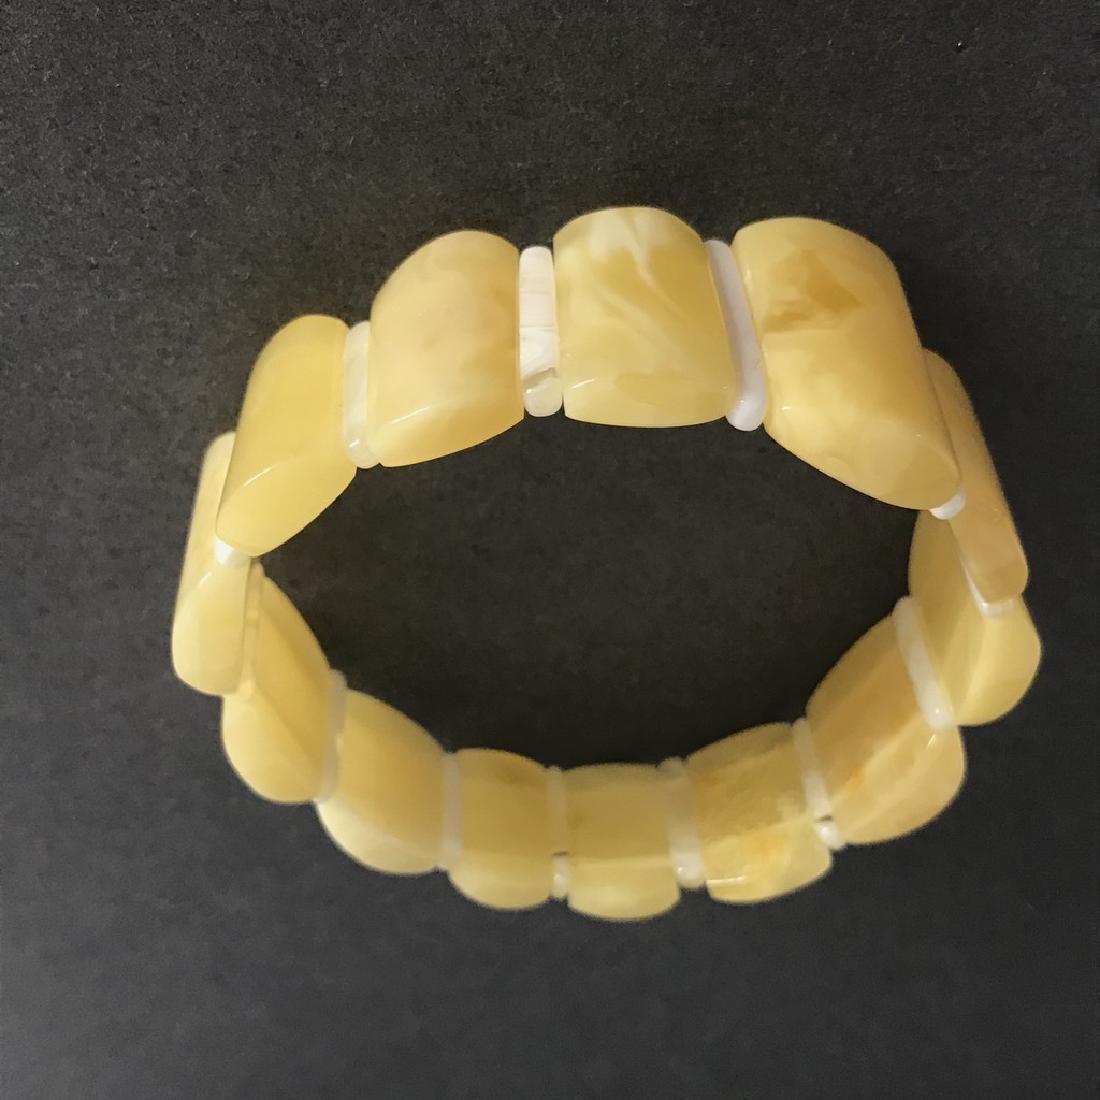 Vintage bracelet Baltic amber white egg yolk 15-24mm, - 4